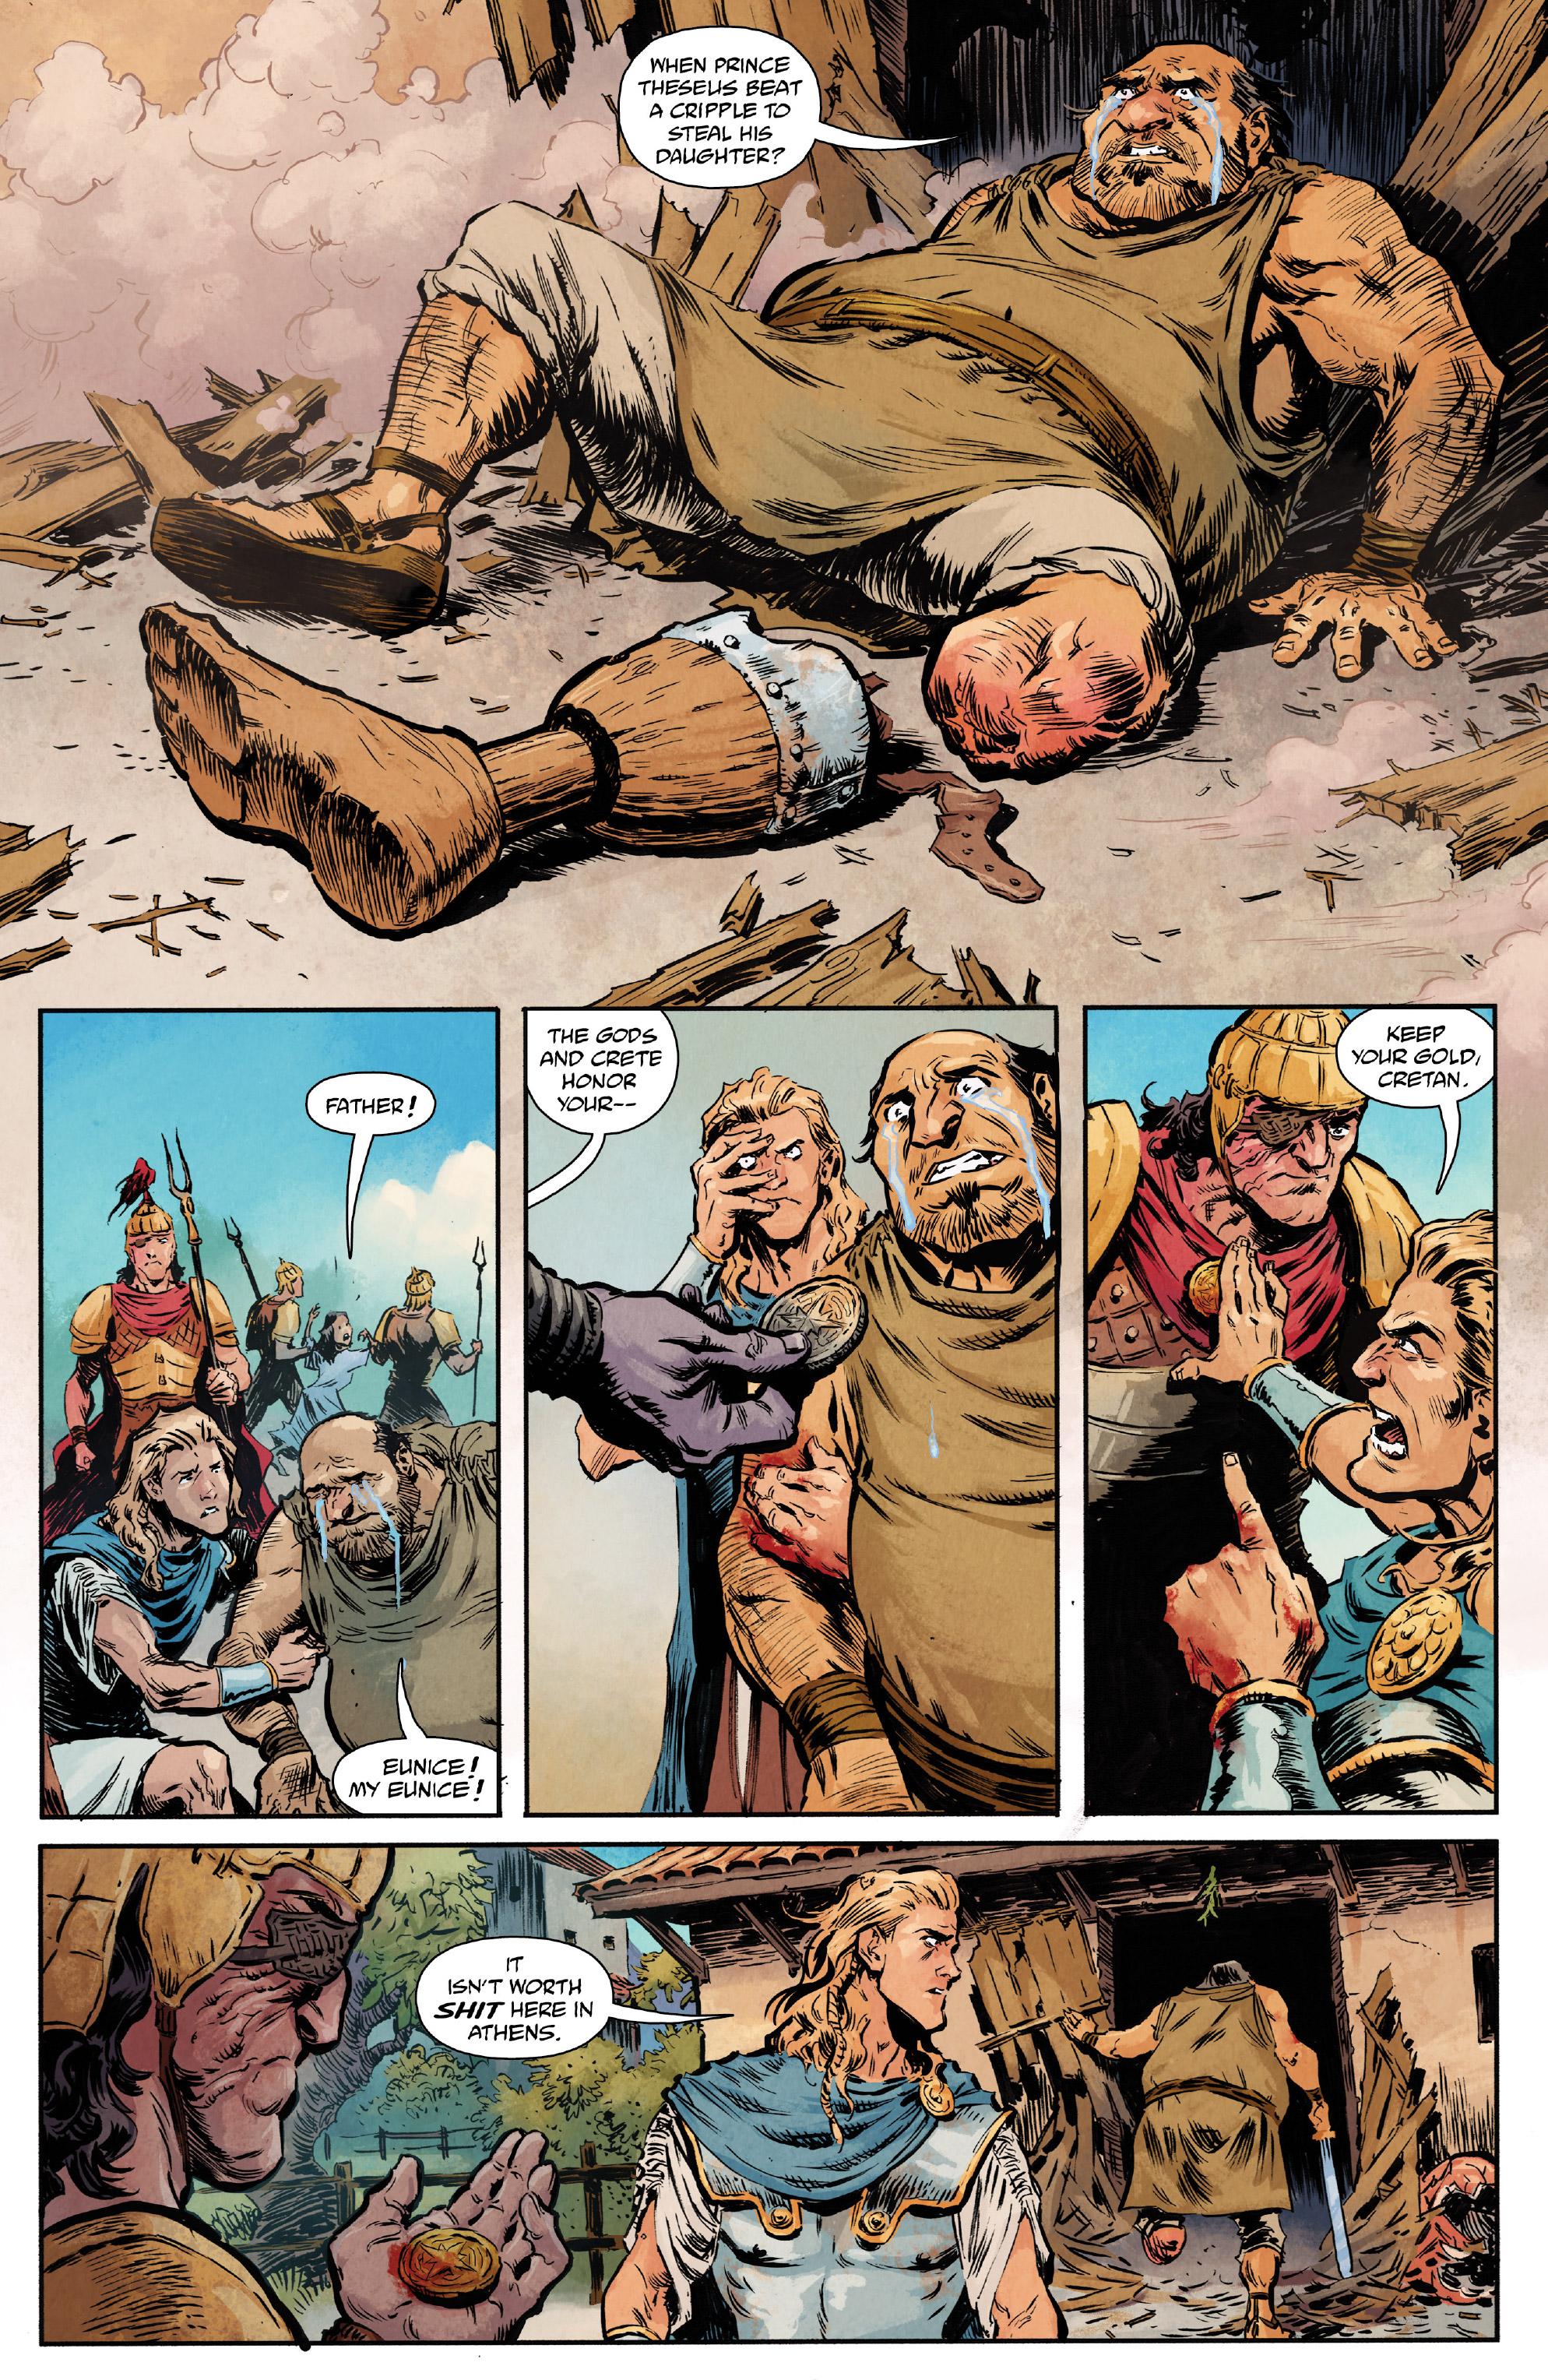 Kill The Minotaur 1 Read Kill The Minotaur Issue 1 Page 15